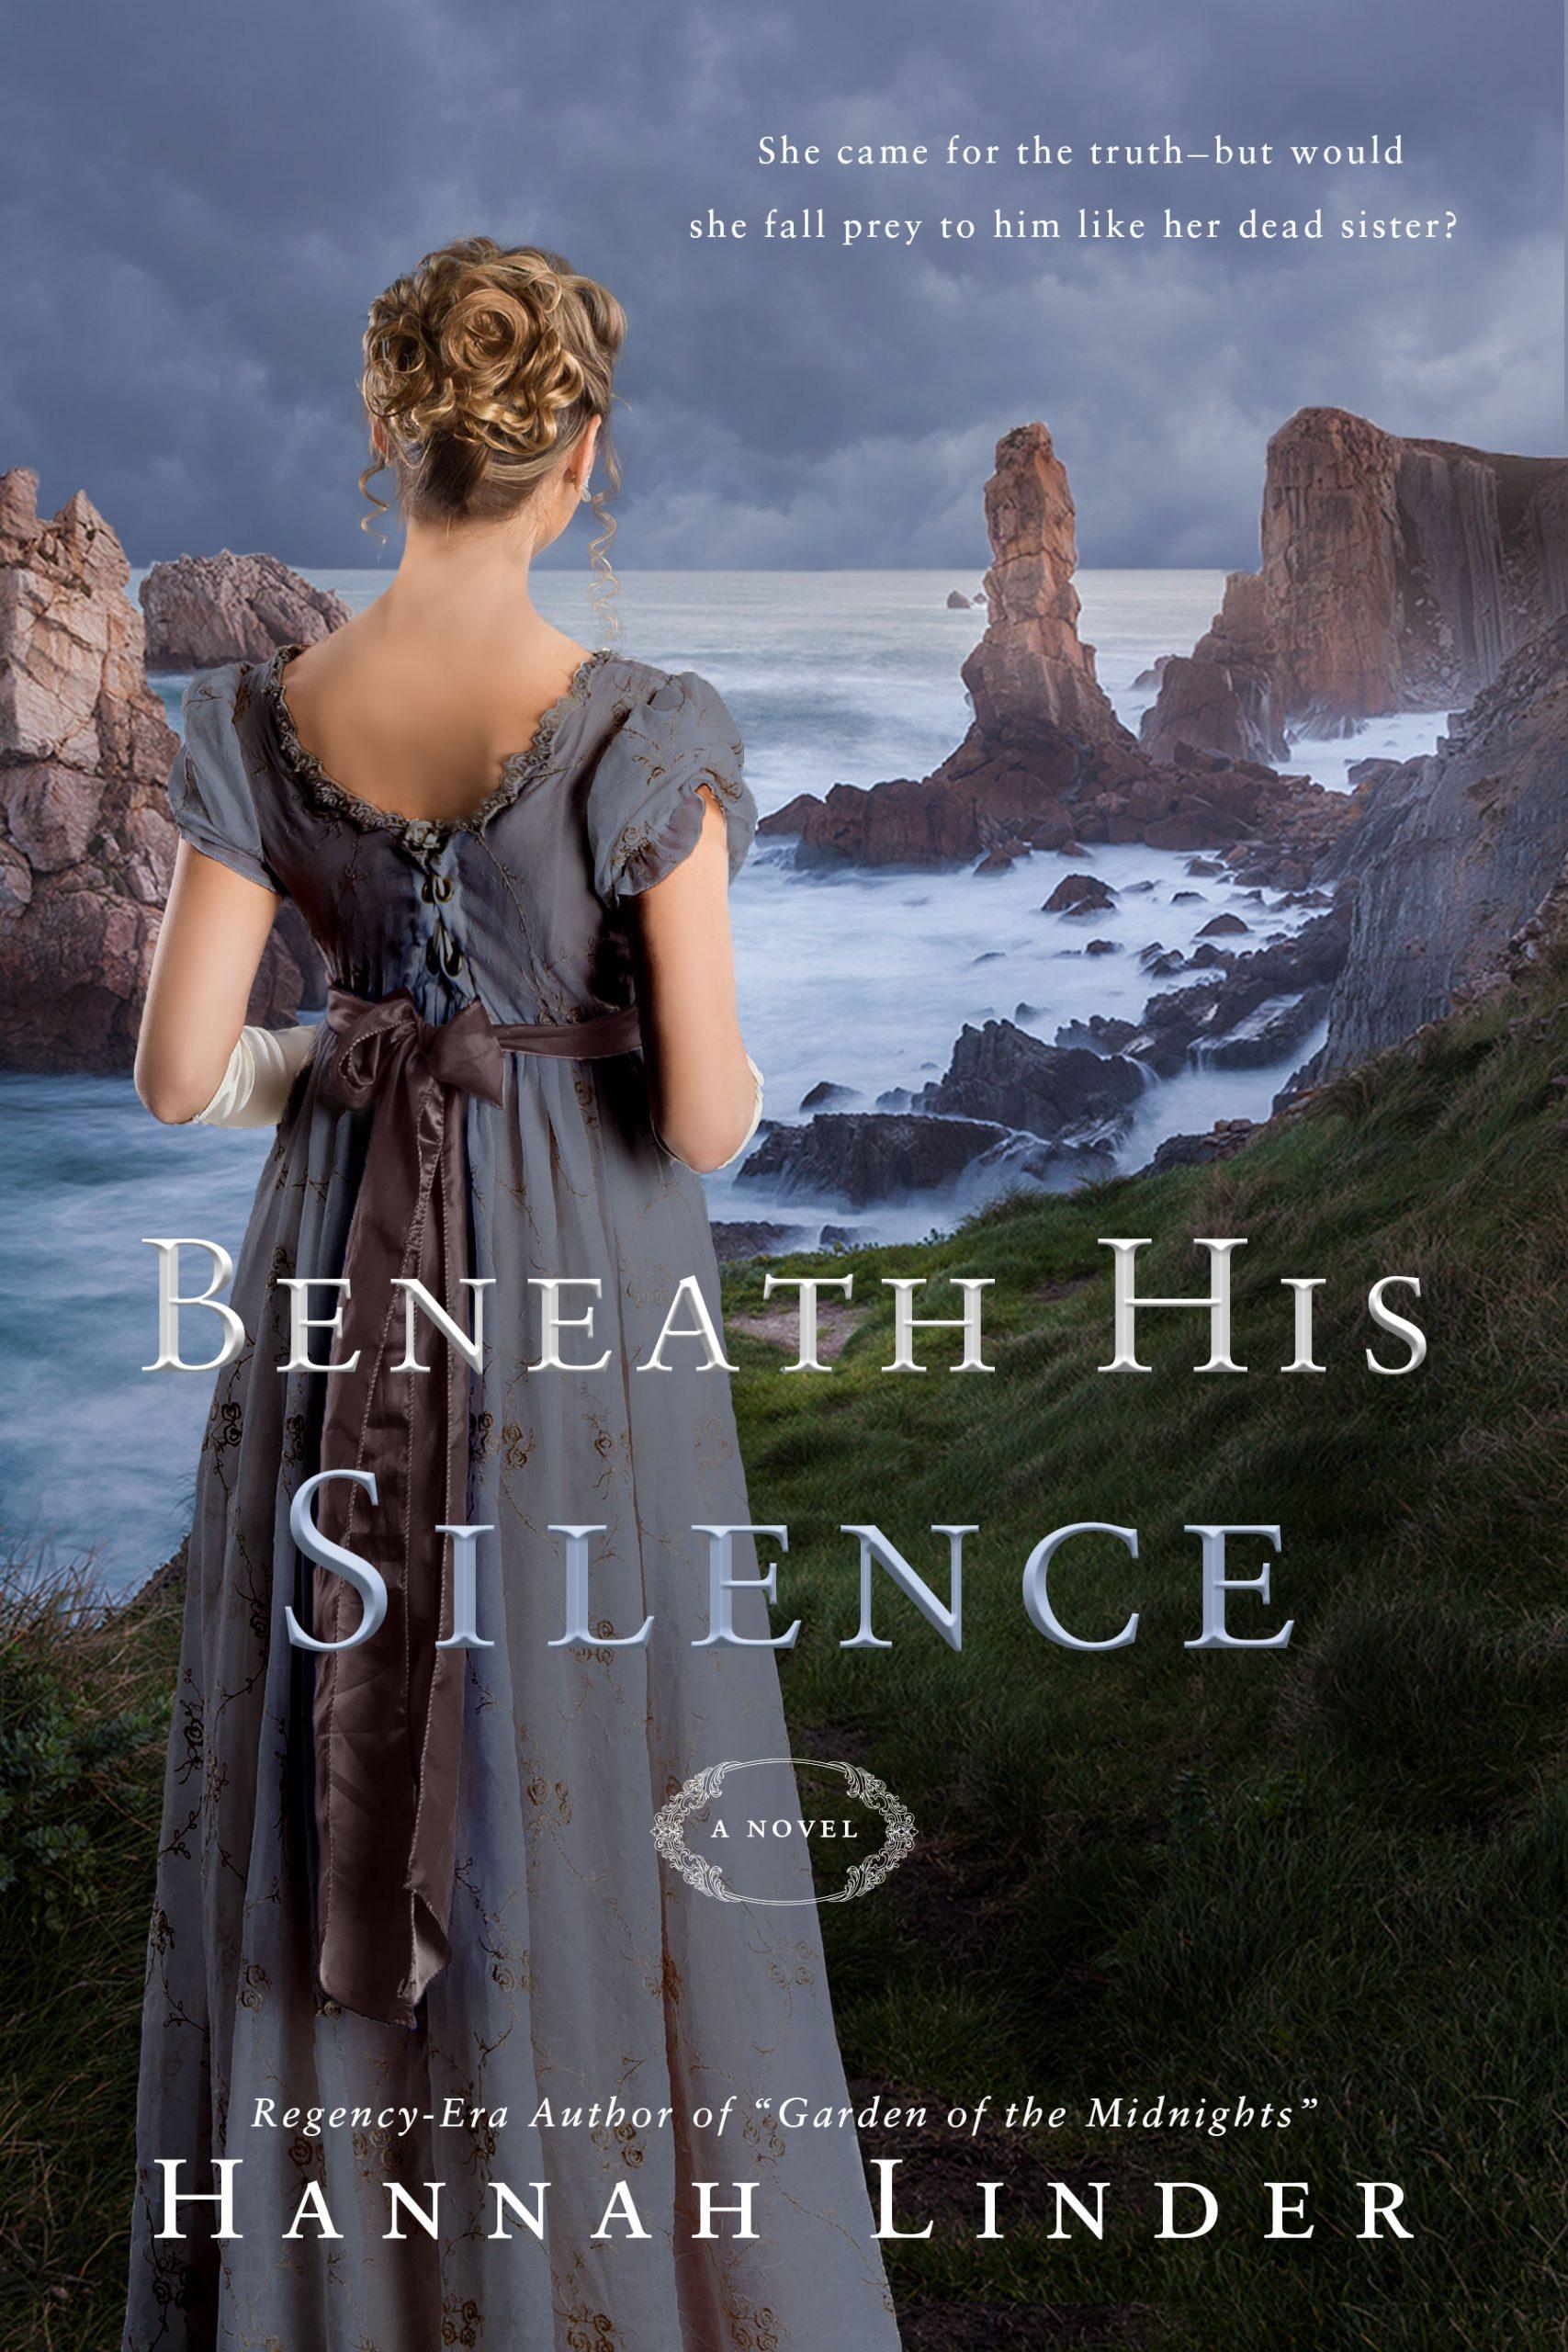 Beneath His Silence